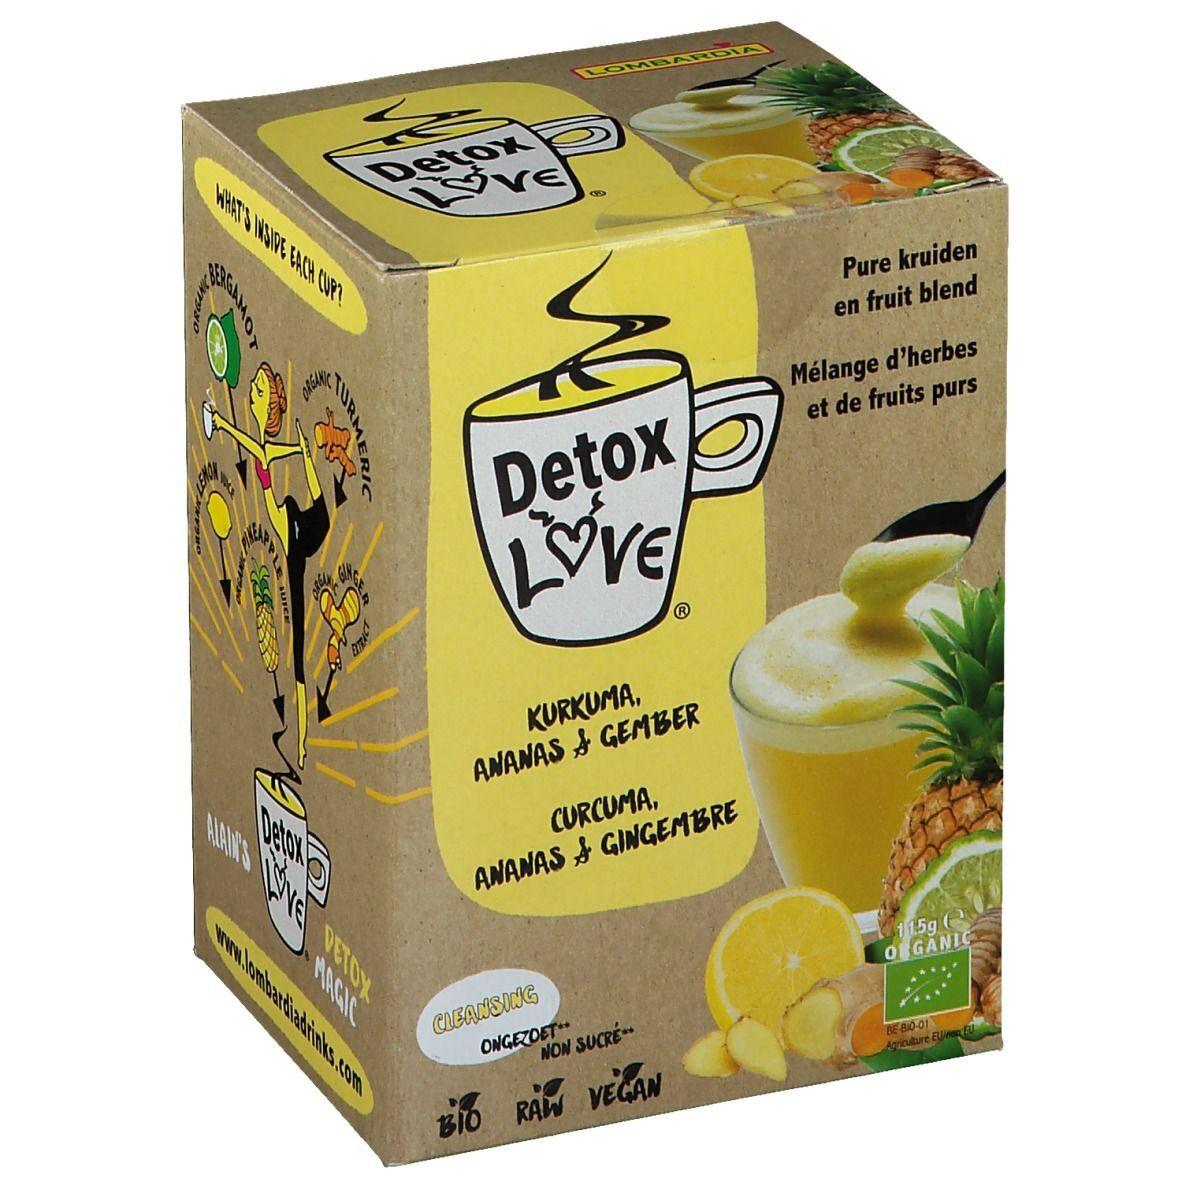 Detox Love DetoxLove Thé Curcuma, Ananas & Gingembre Bio pc(s) sachet(s) filtre(s)